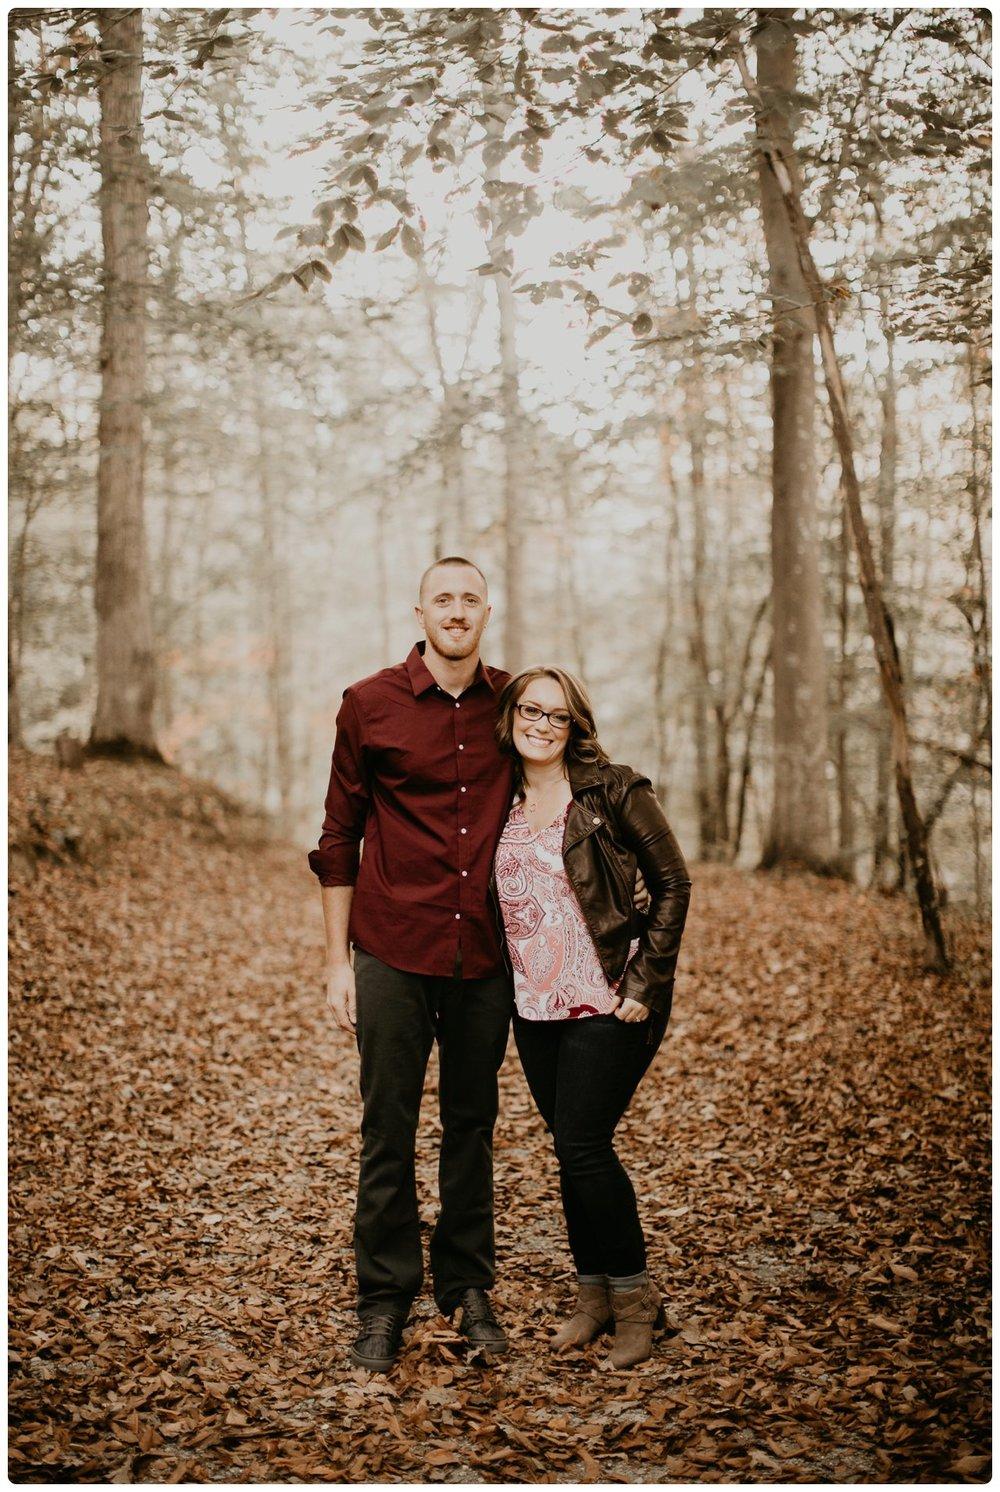 Engagement-Roanoke-Virginia-Pat-Cori-Photography-002.jpg